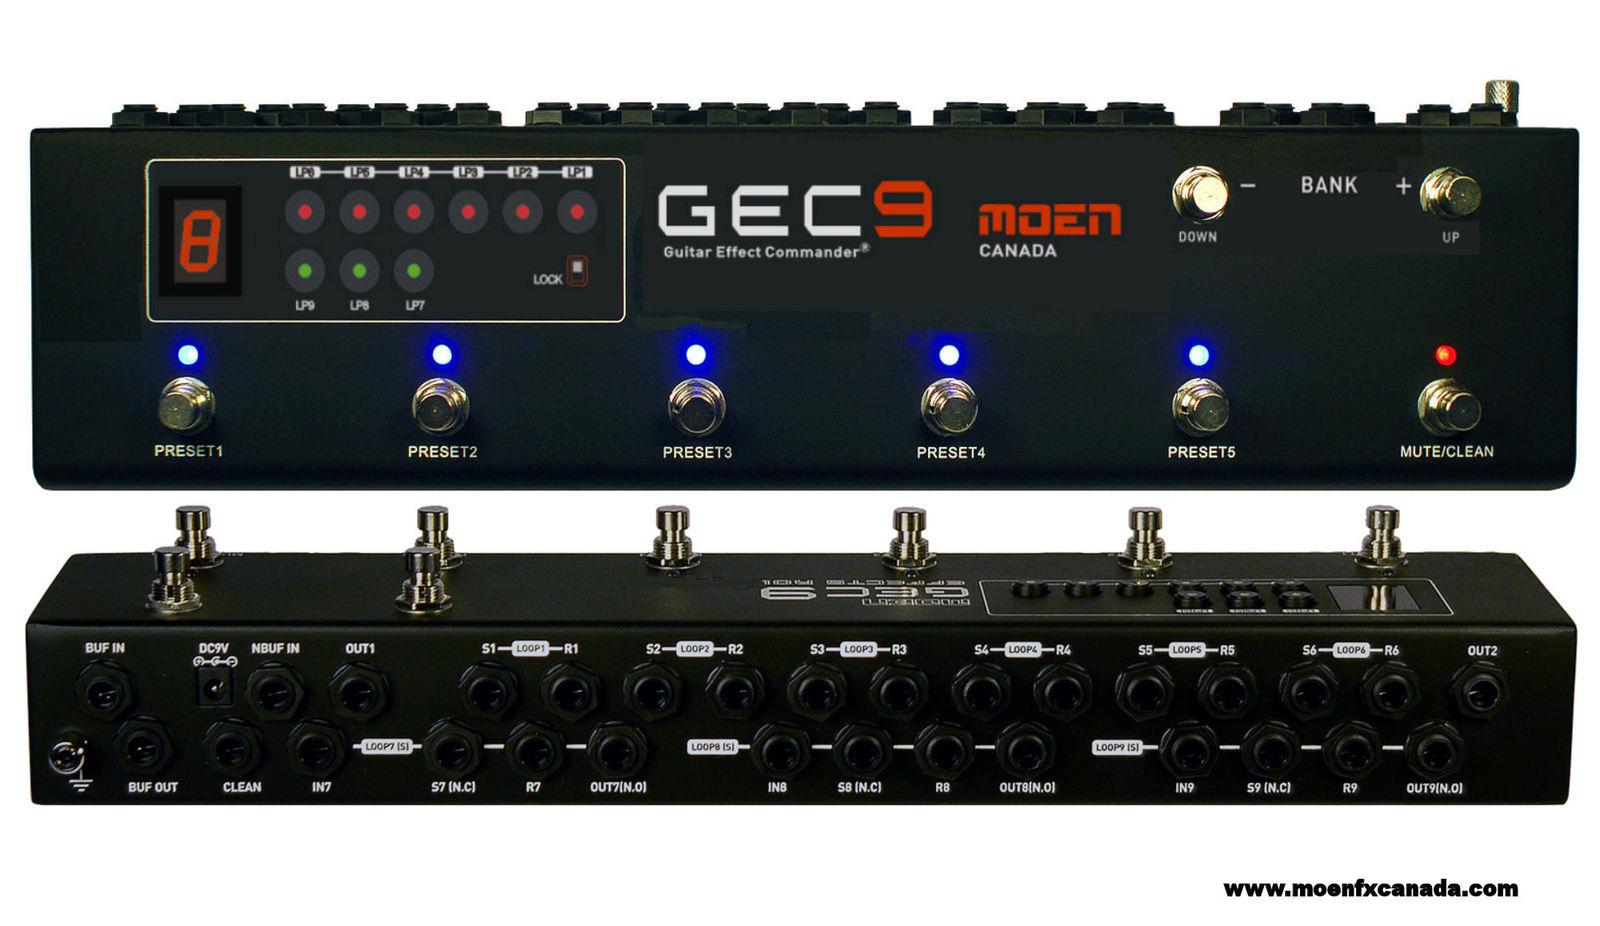 moen canada gec 9 v2 pedal switcher guitar and similar items rh bonanza com